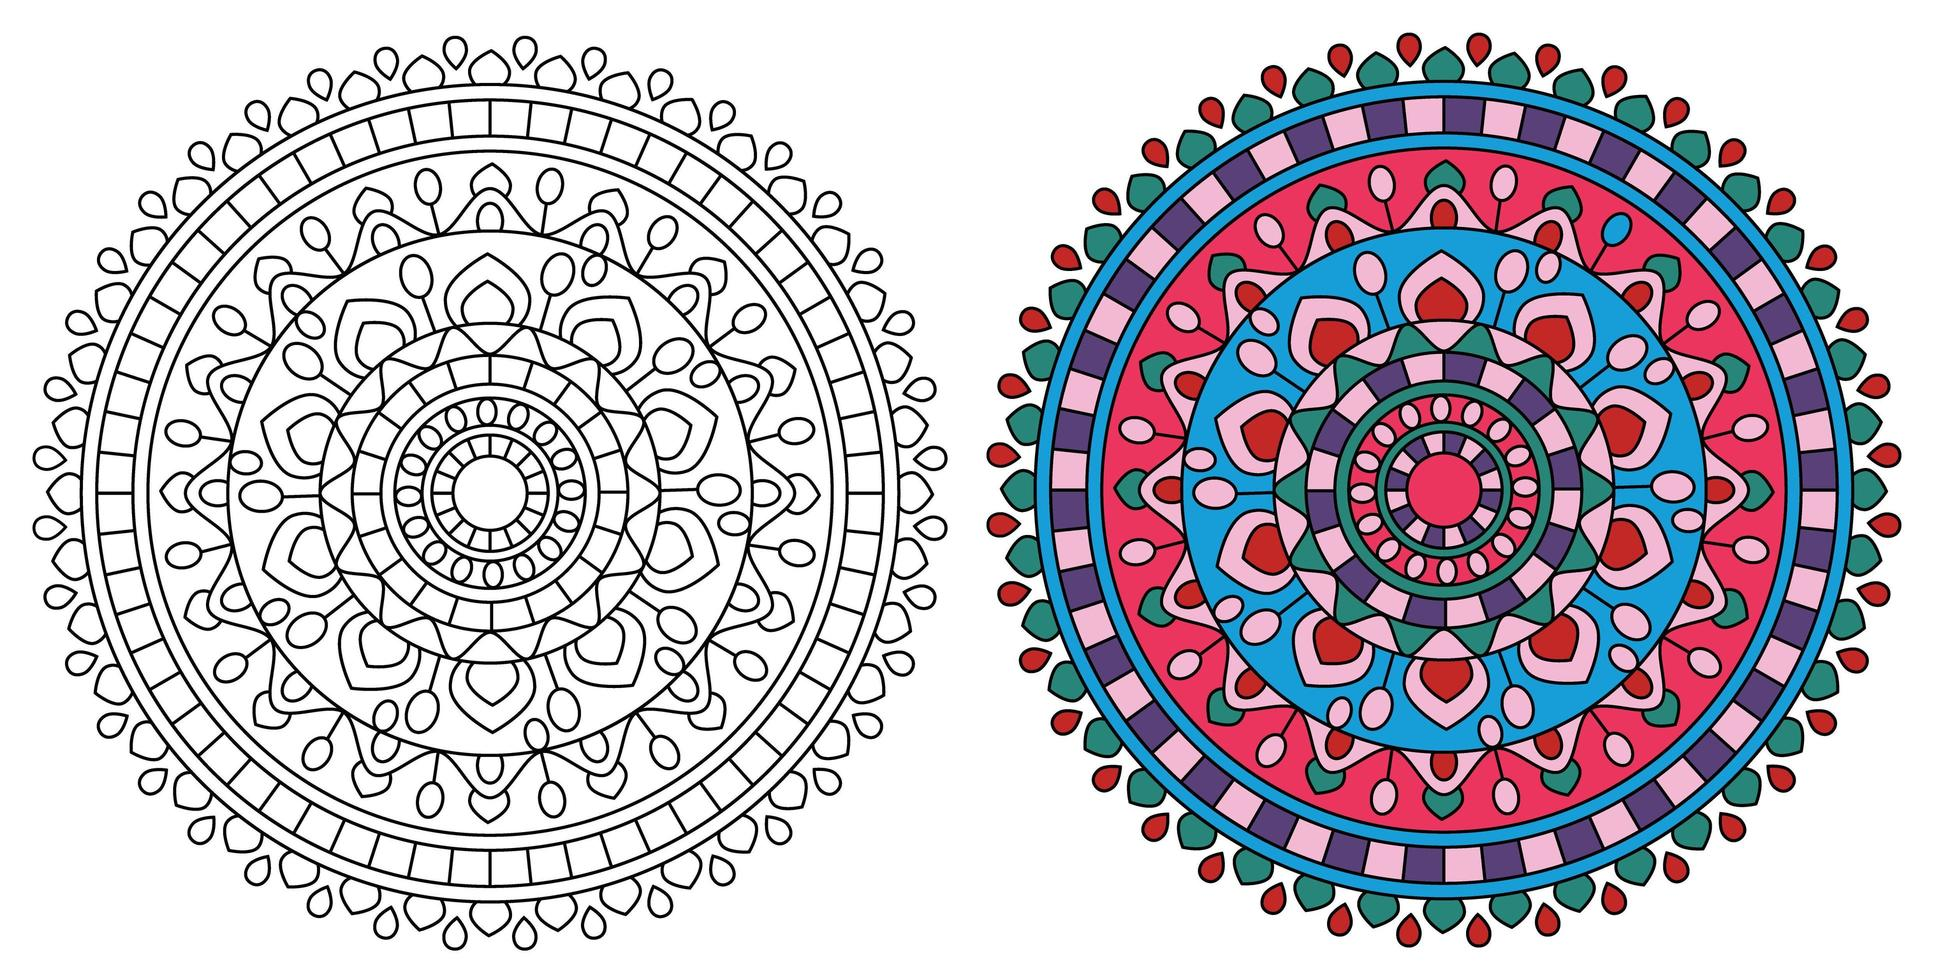 Mandala Round Bright Design Coloring Page vector